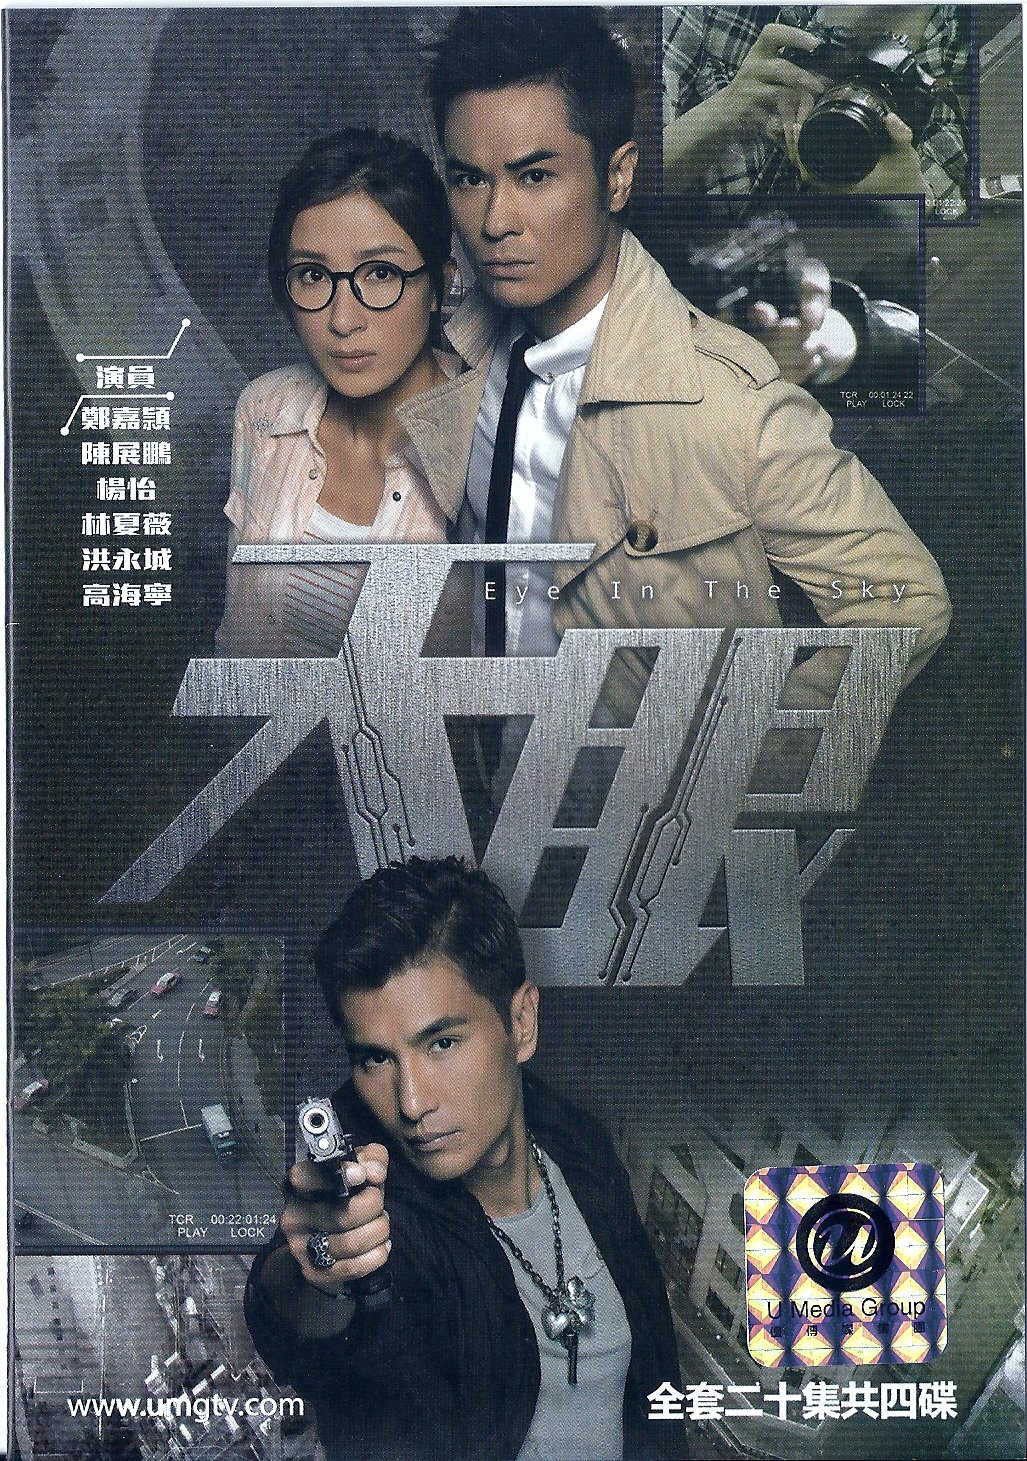 Amazon com: Eye in the Sky (TVB Drama, English subtitles